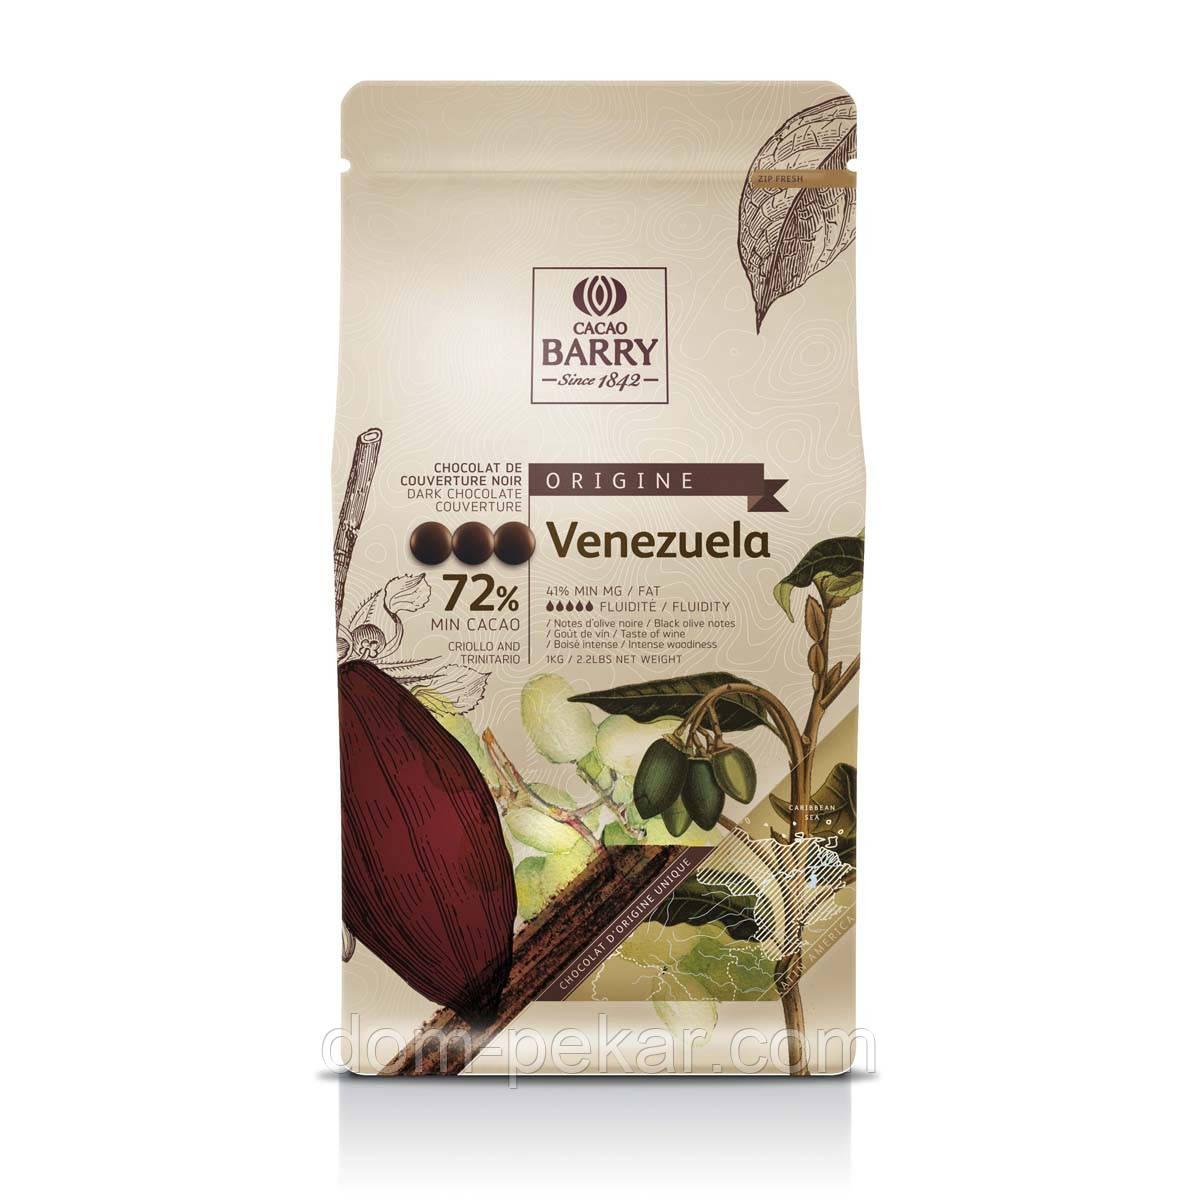 Шоколад кувертюр Cacao Barry VENEZUELLA черный 72% CHD-P72VEN, 1 кг